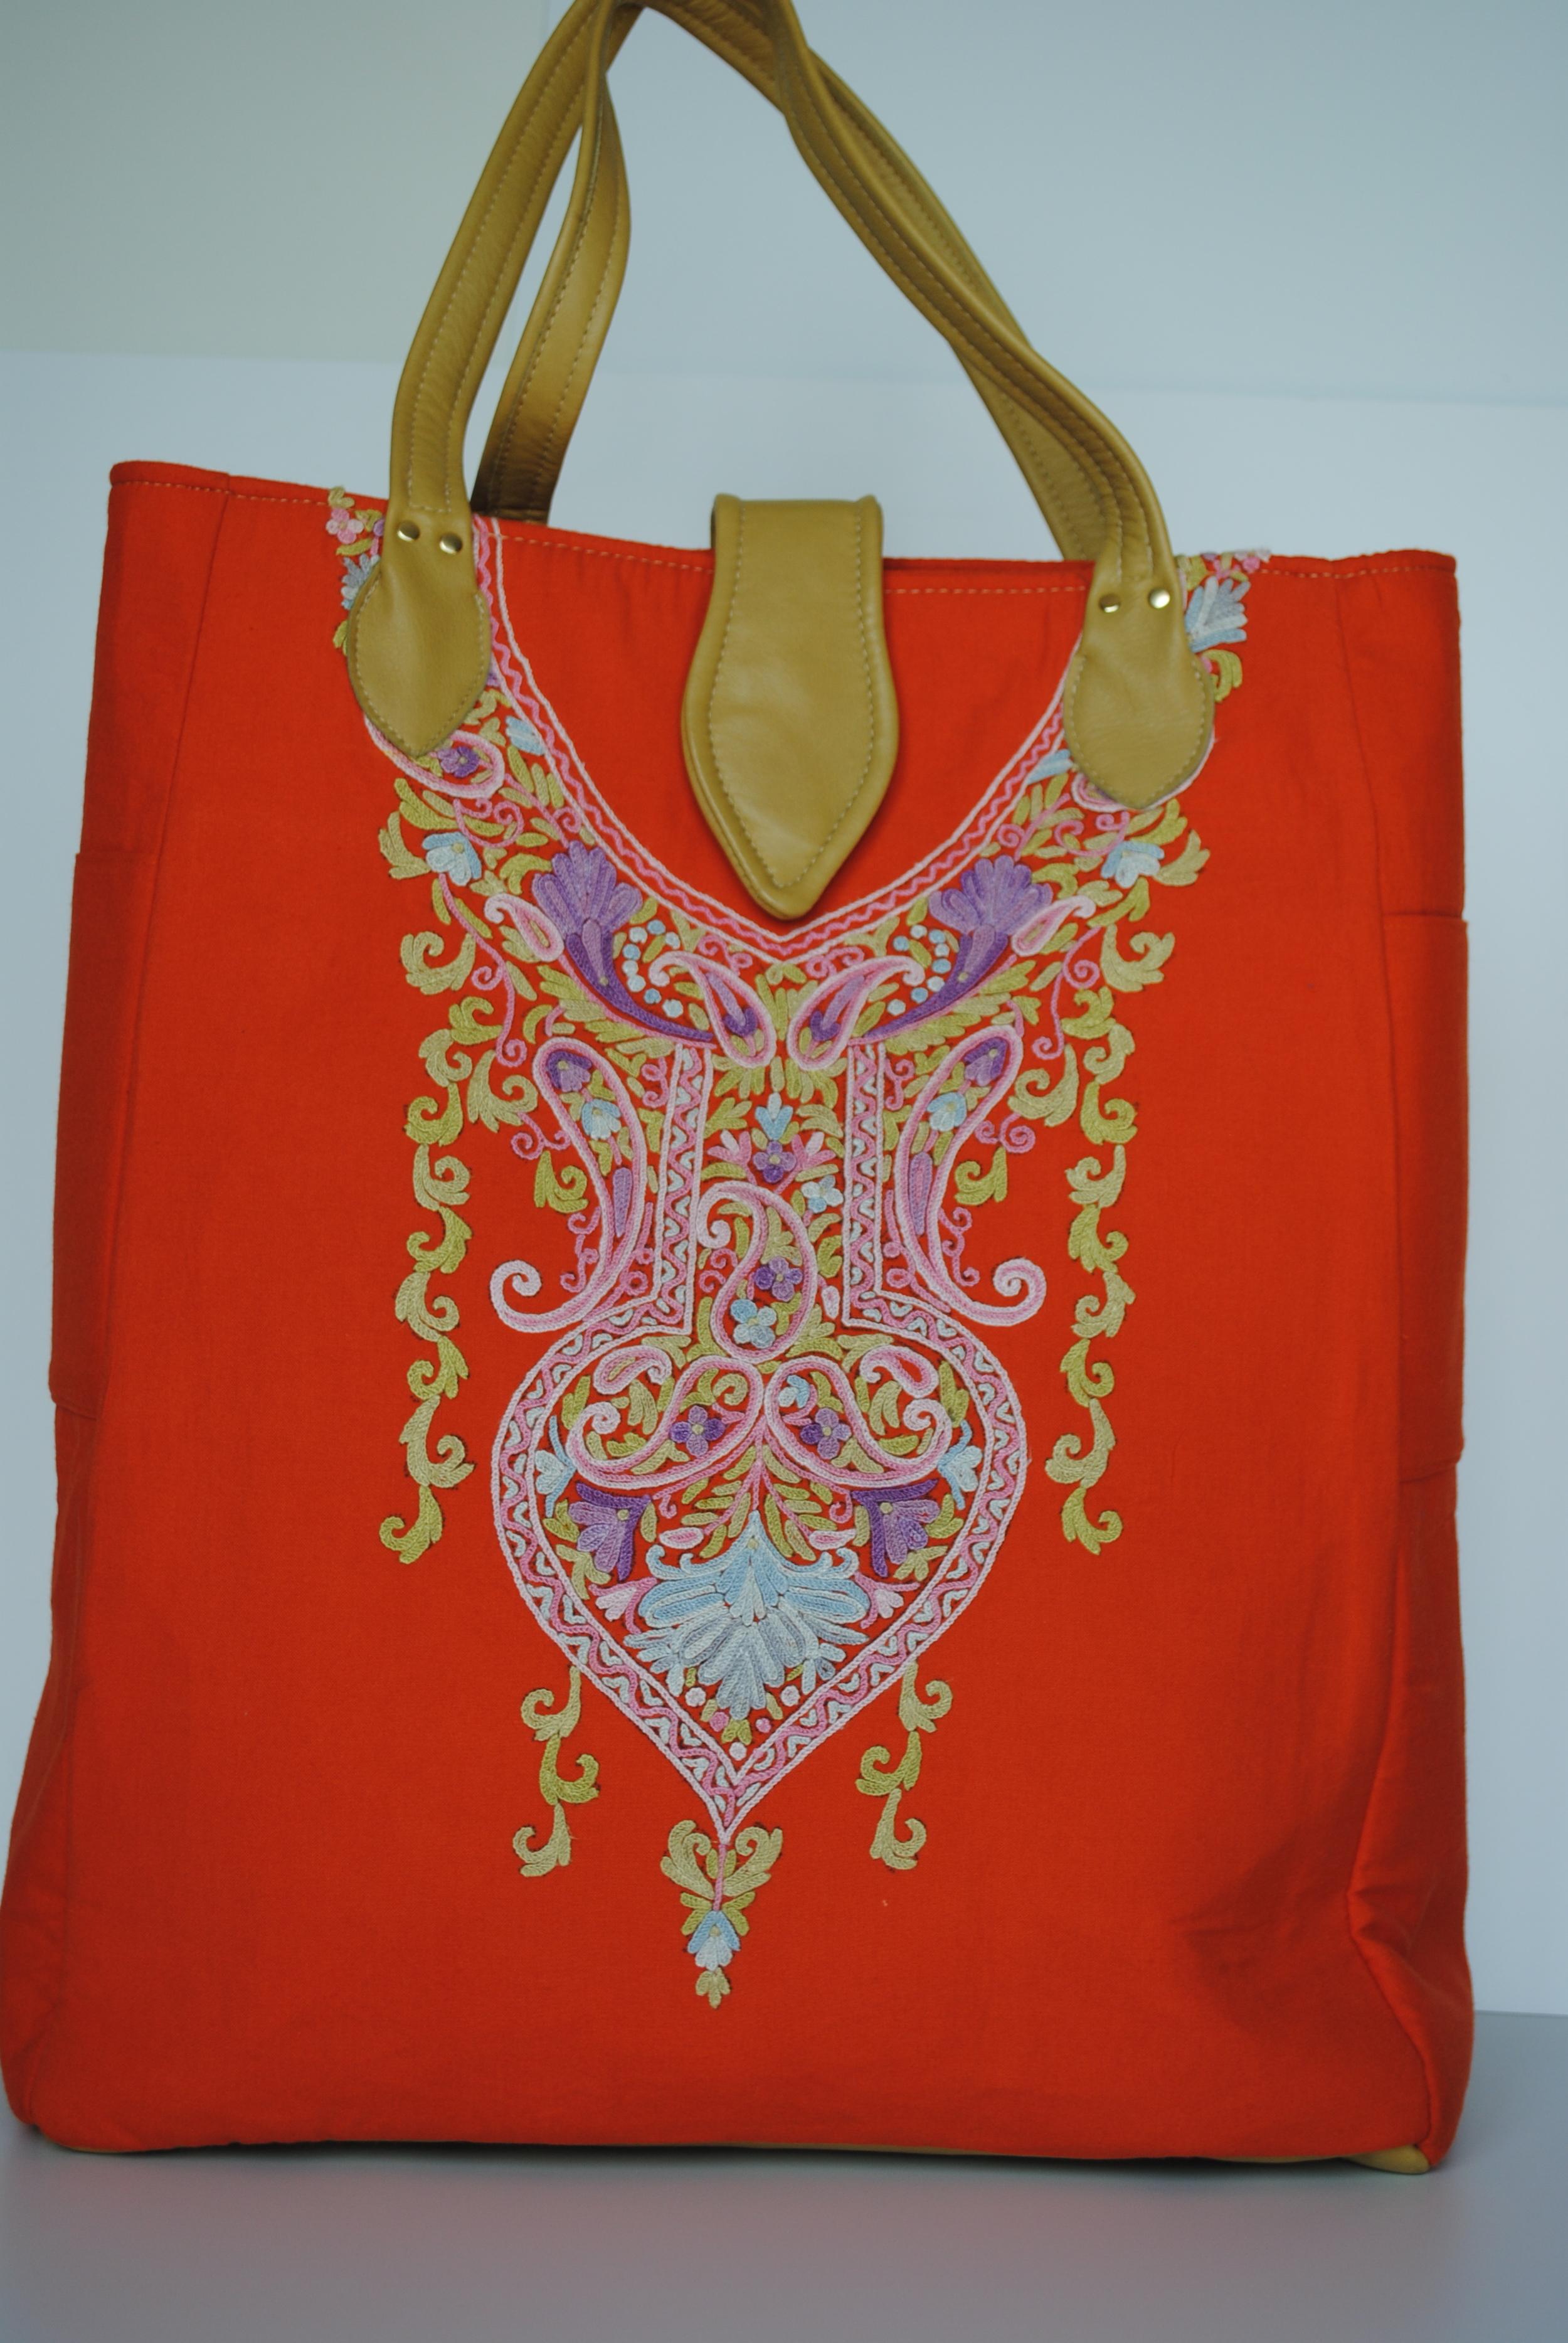 Shalimar Royal Garden Shopper